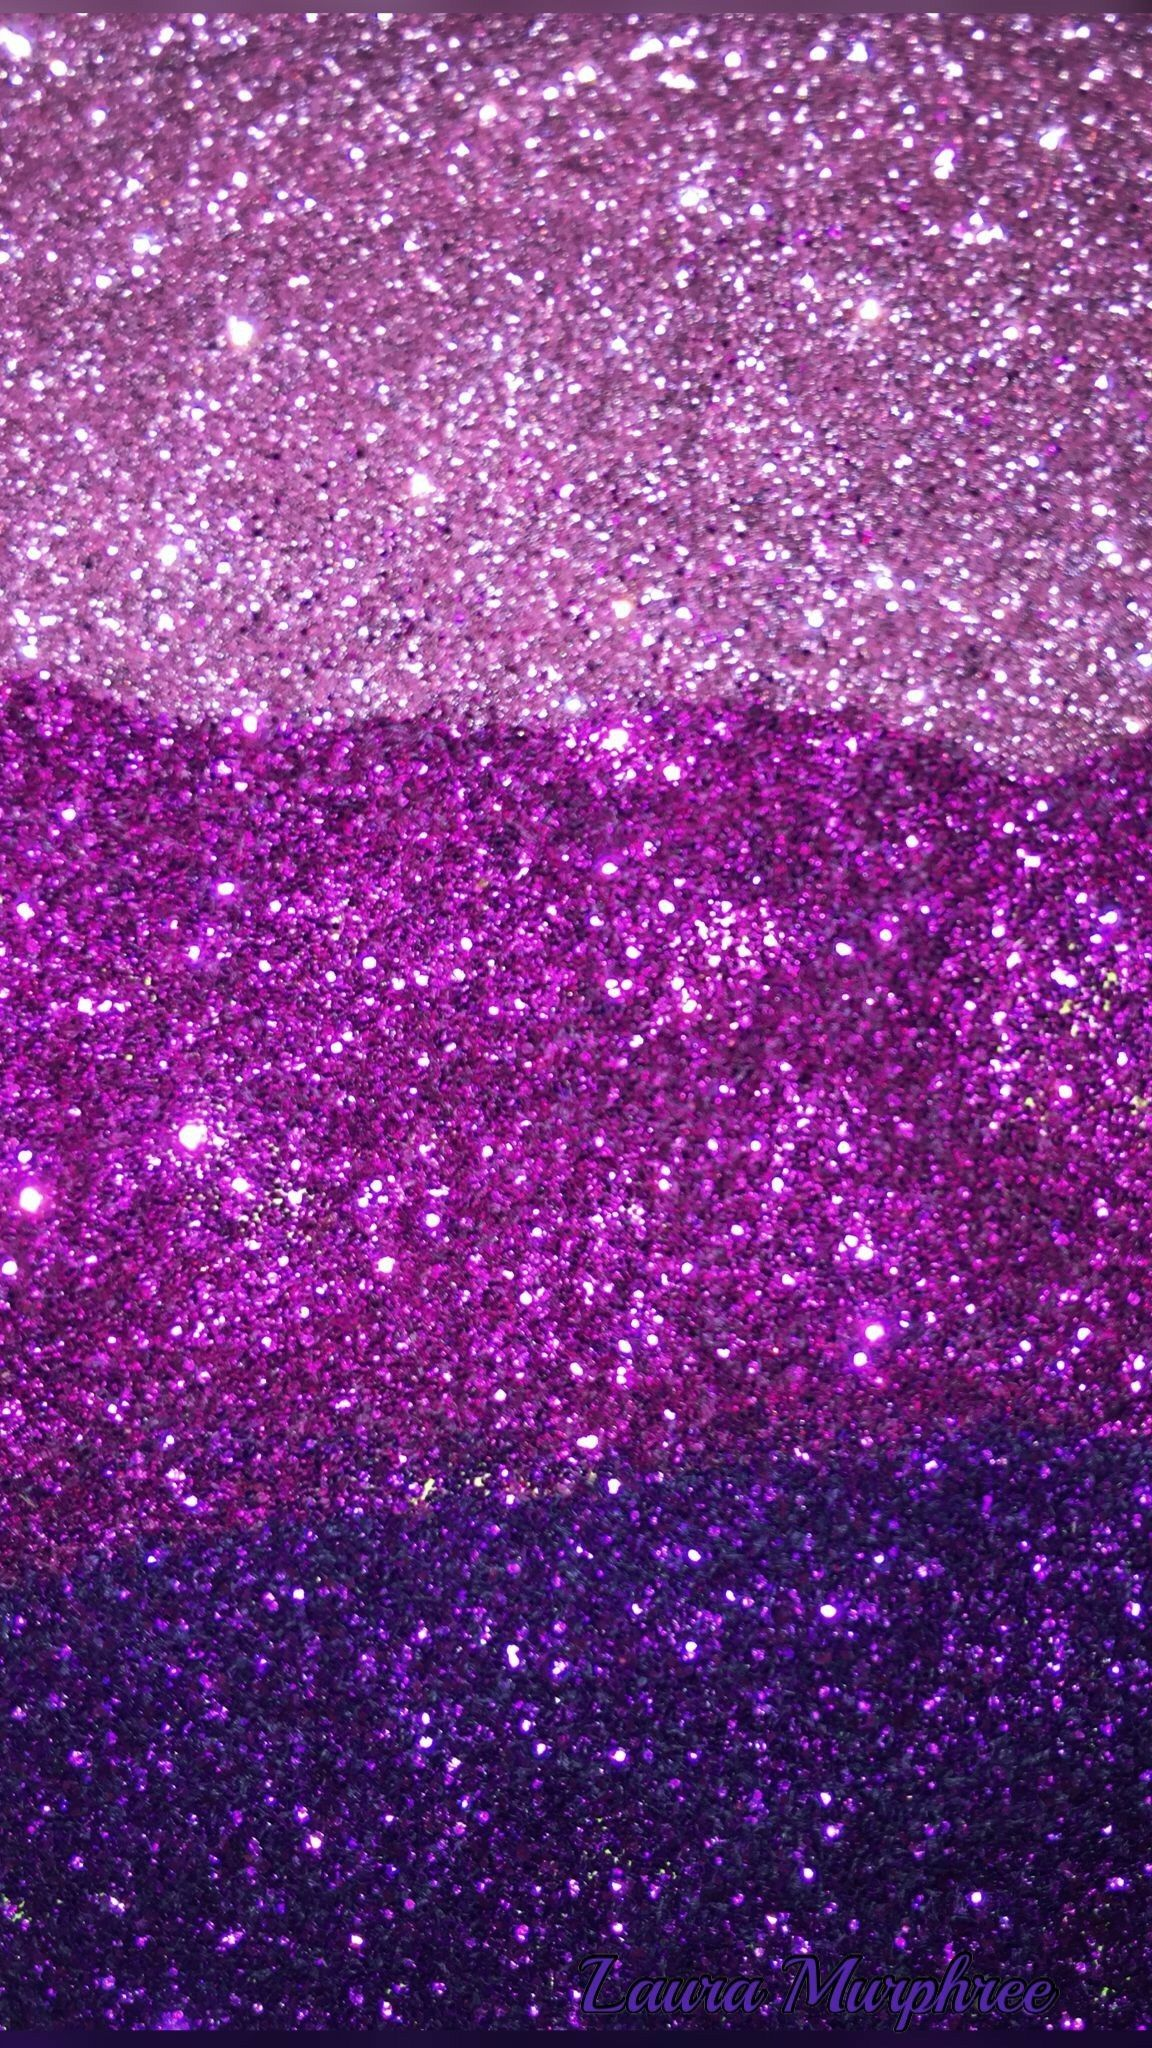 Pin By Faith Seh On Pretty Wallpaper Glitter Phone Wallpaper Sparkles Background Glitter Wallpaper